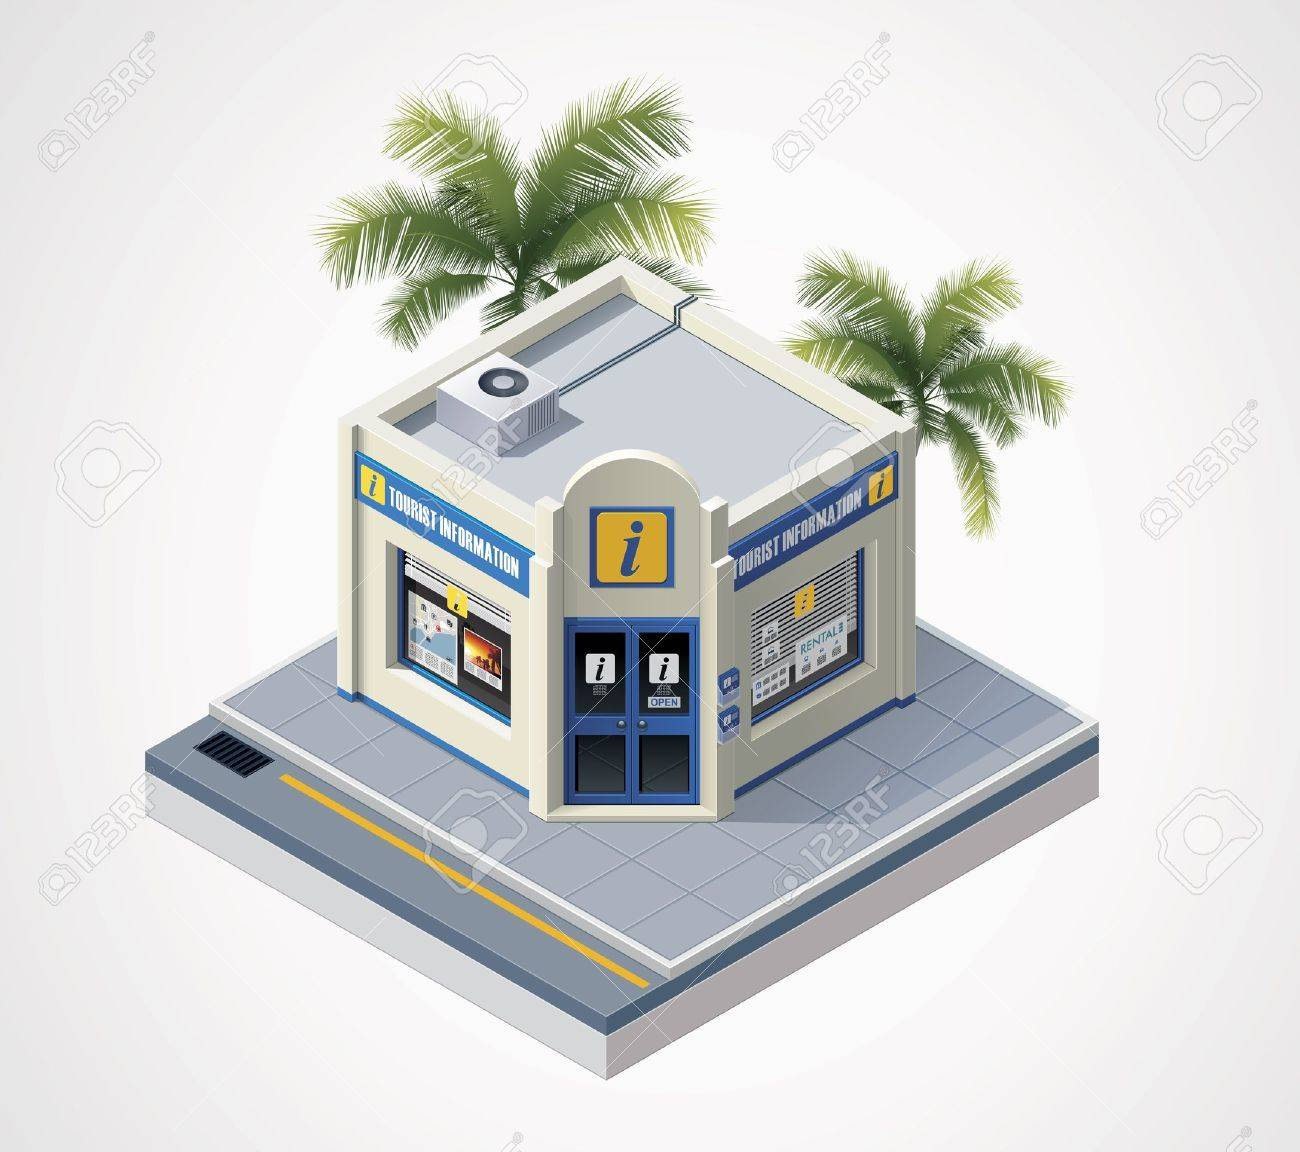 Tourist Office Clipart